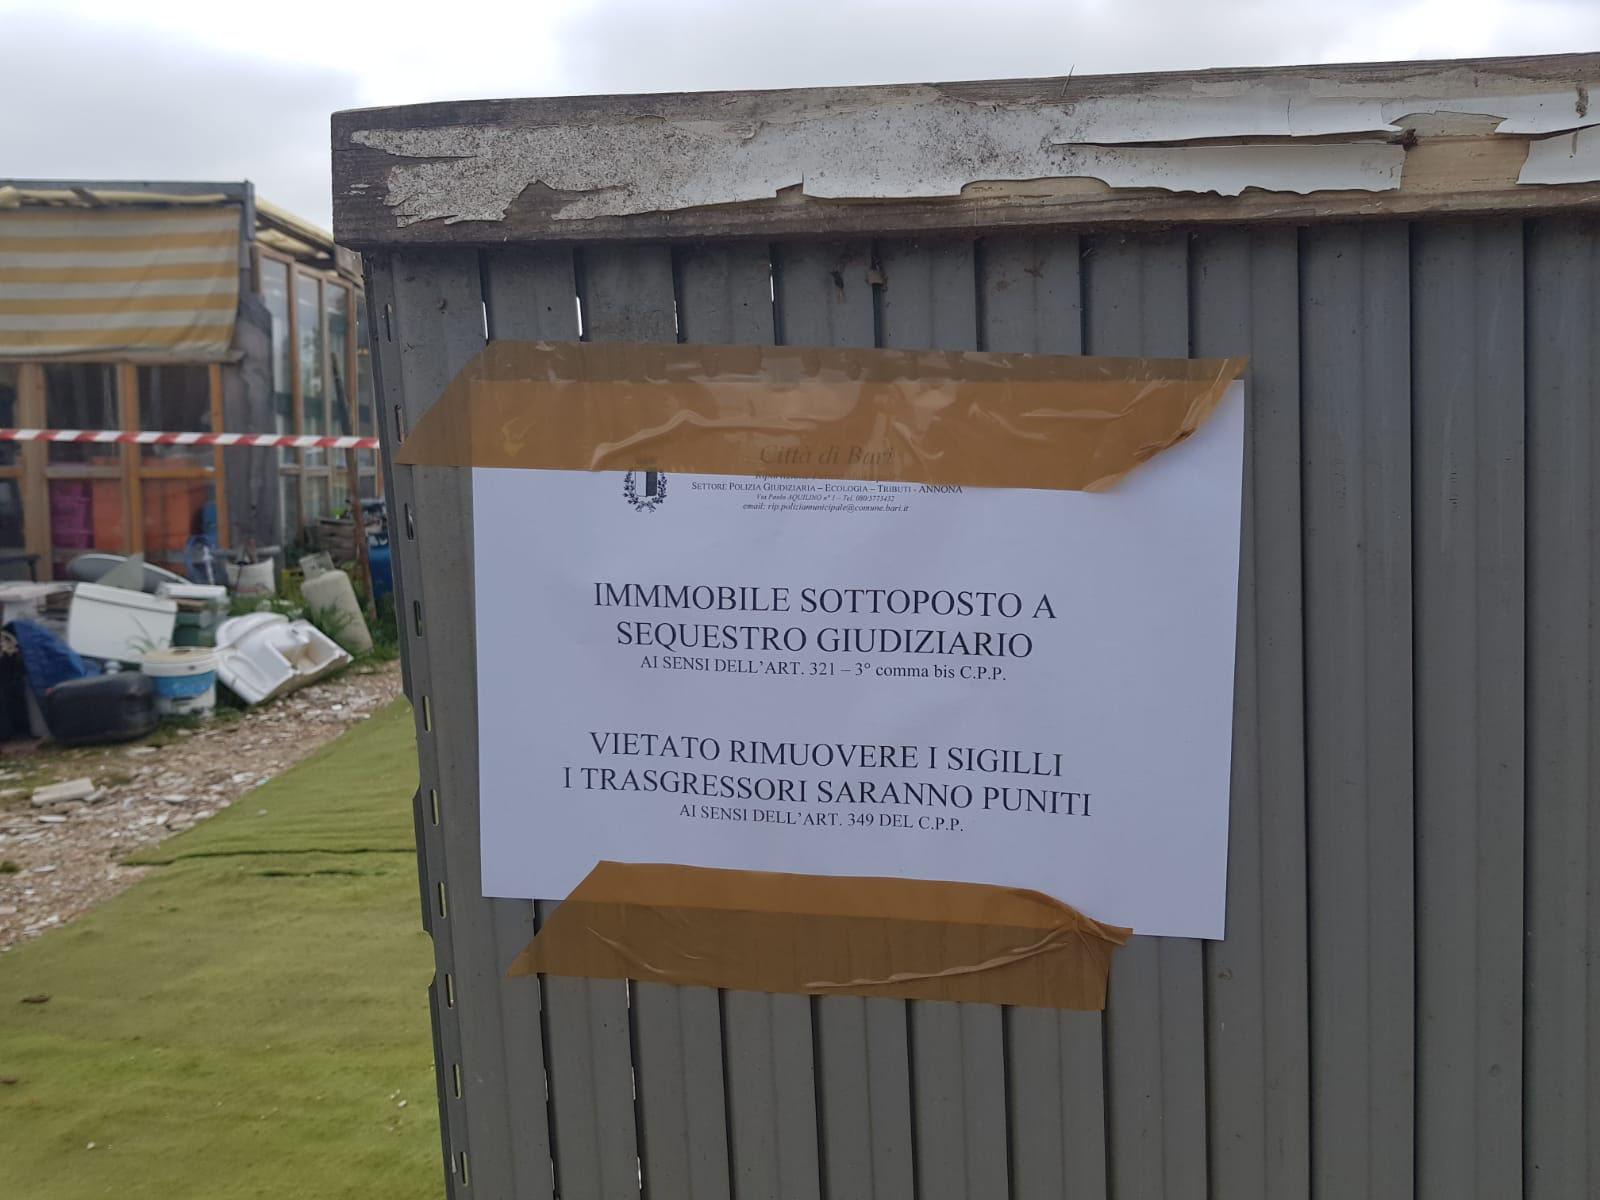 Carbonara Di Bari Storia carbonara, sequestrata discarica abusiva - benvenuti su